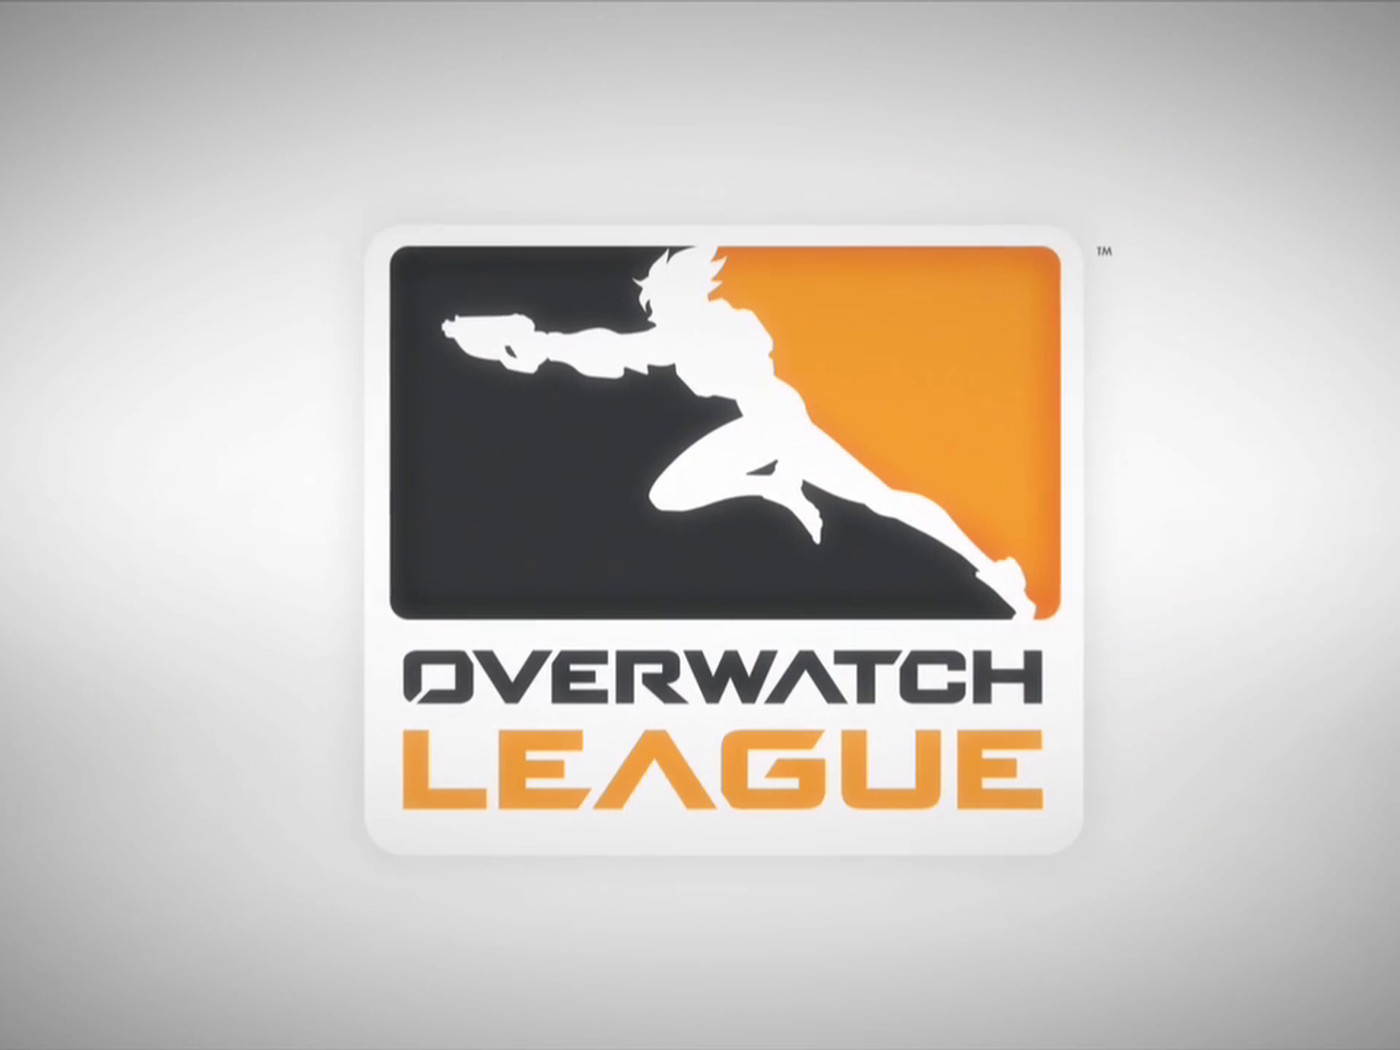 Overwatch League S Logo Could Hit A Snag With Major League Baseball